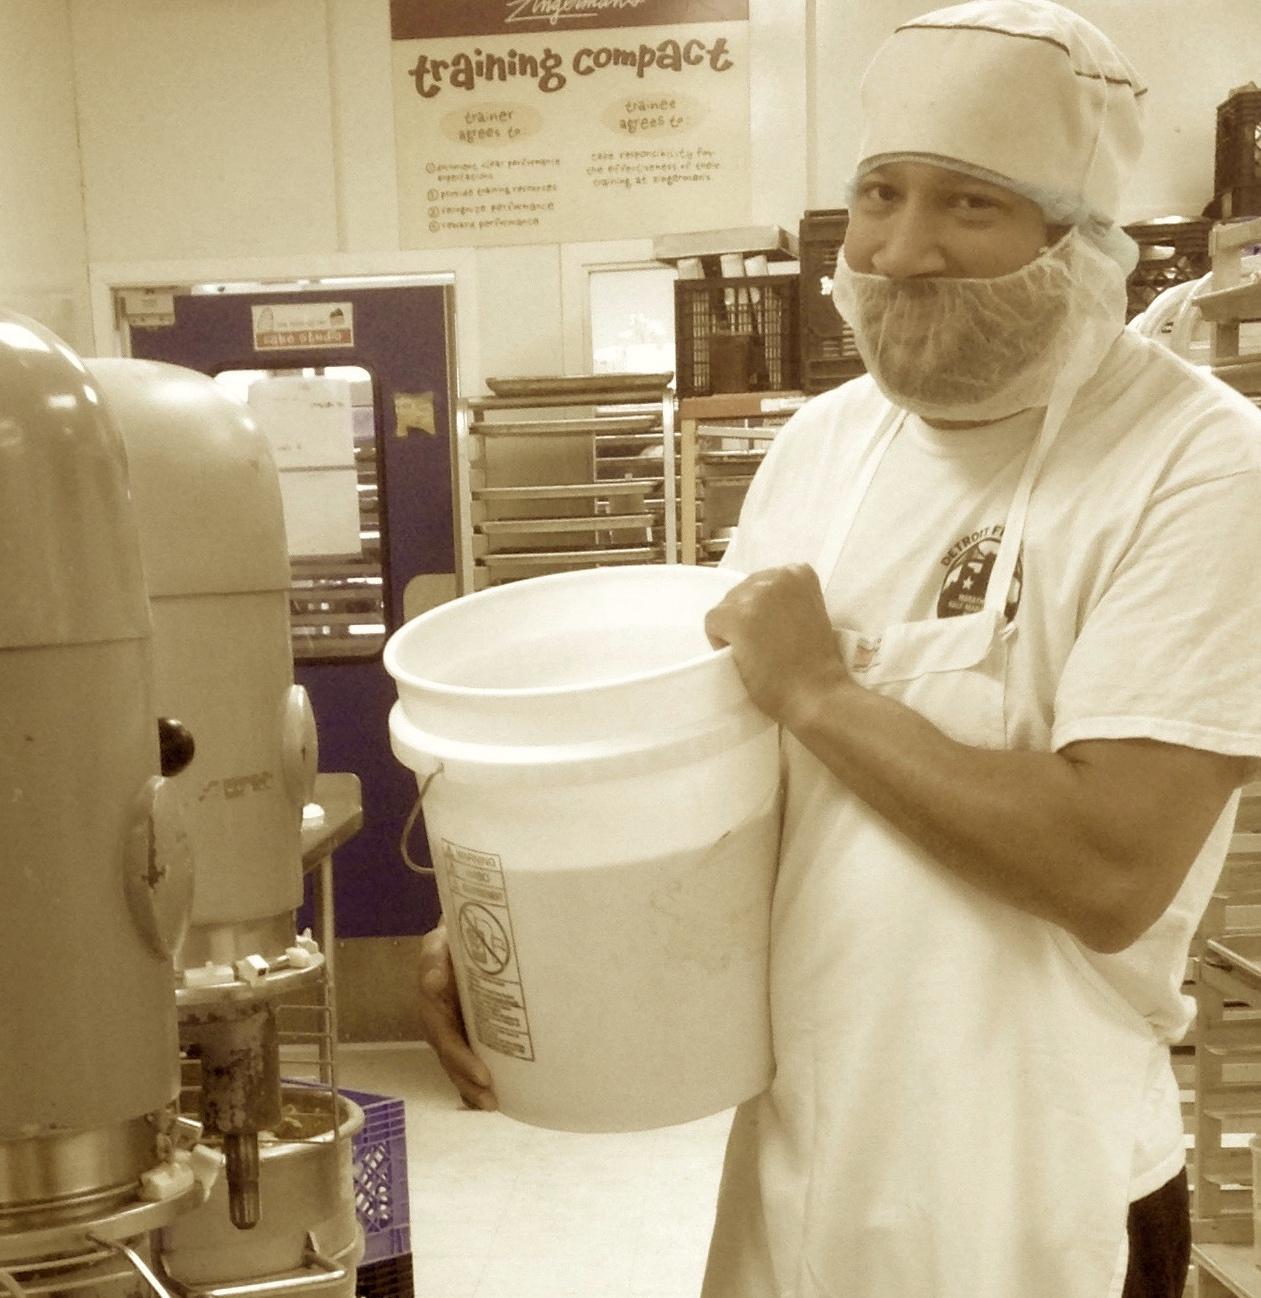 Zingerman's Bakehouse organic flour